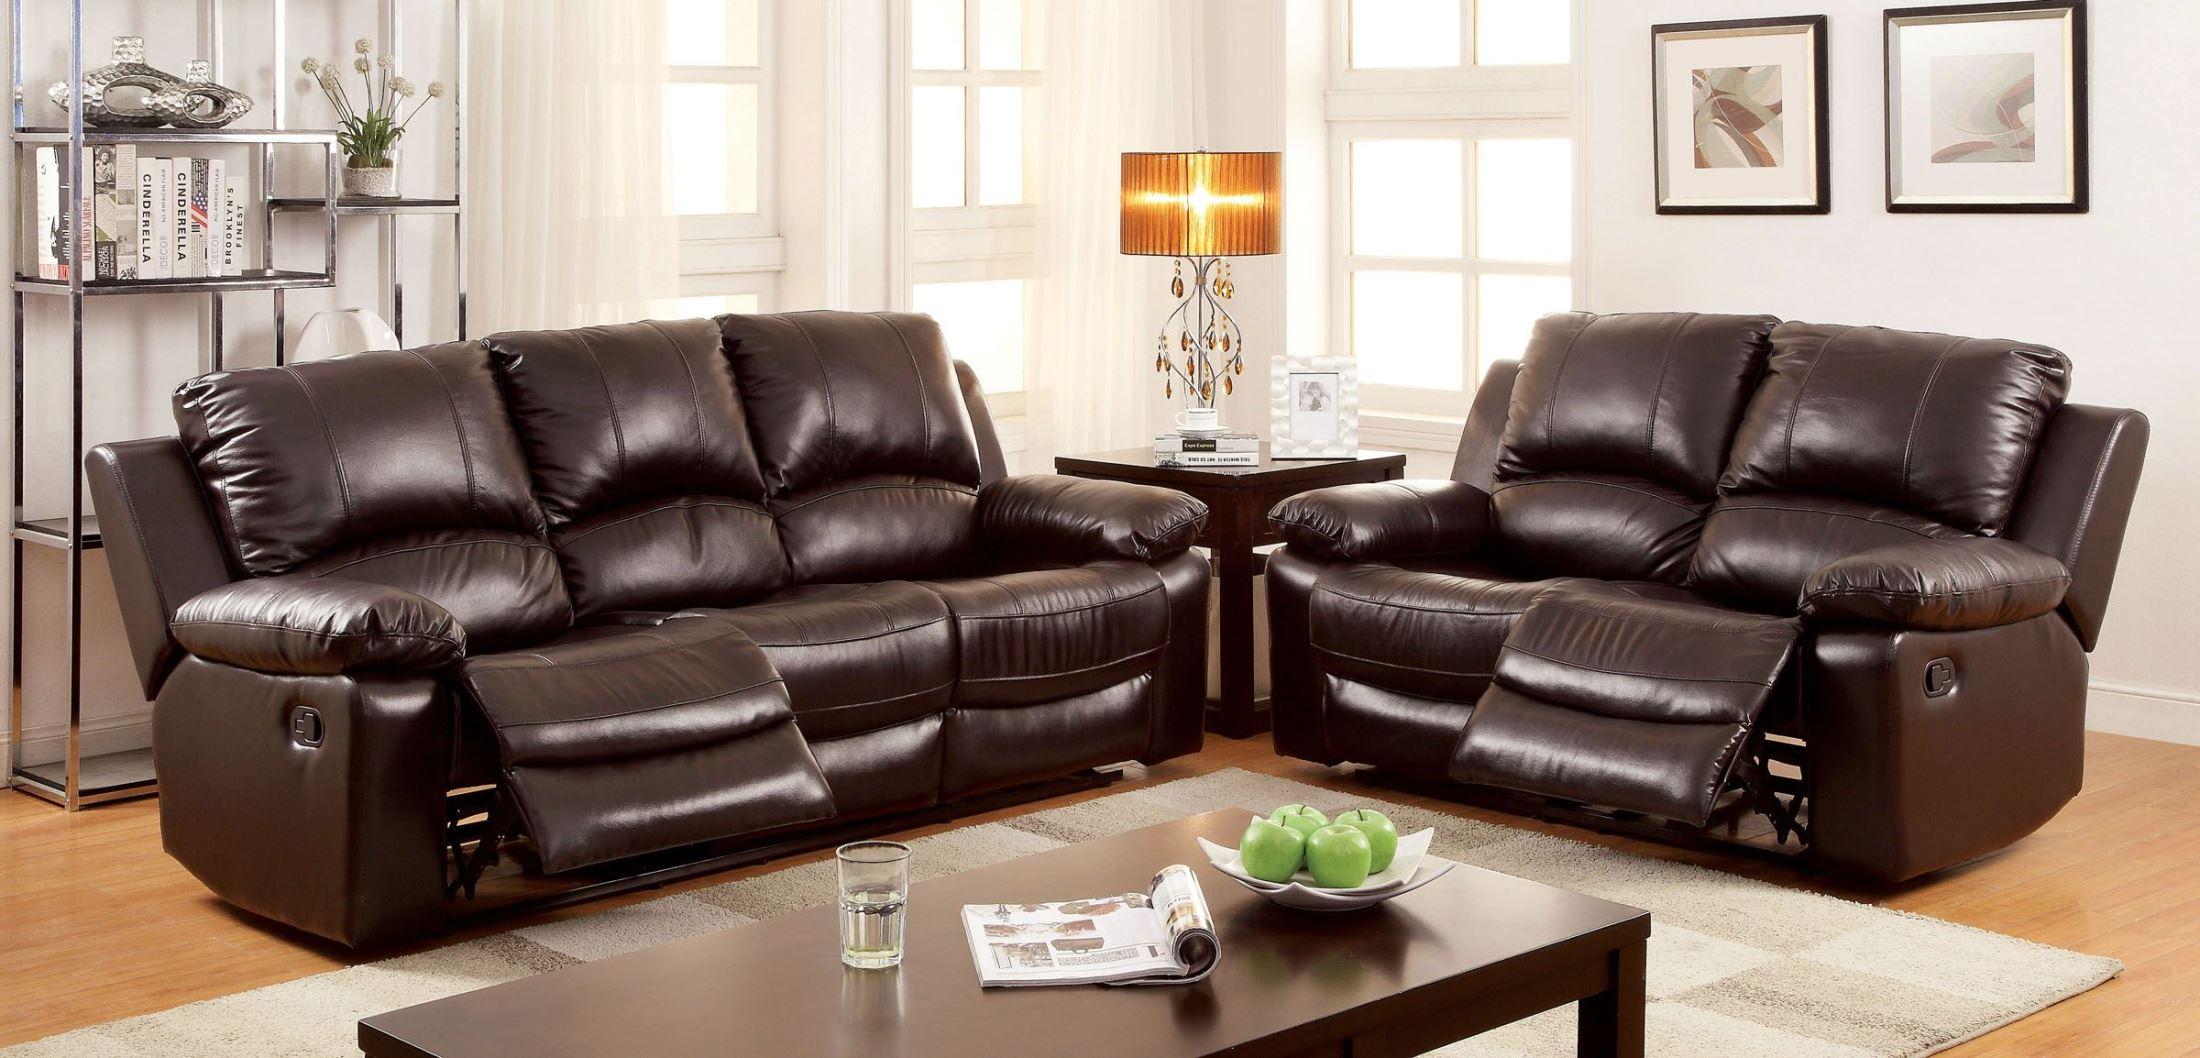 fairfax 3 piece top grain leather reclining living room set simple tv unit designs for india furniture of america davenport match setmedia image